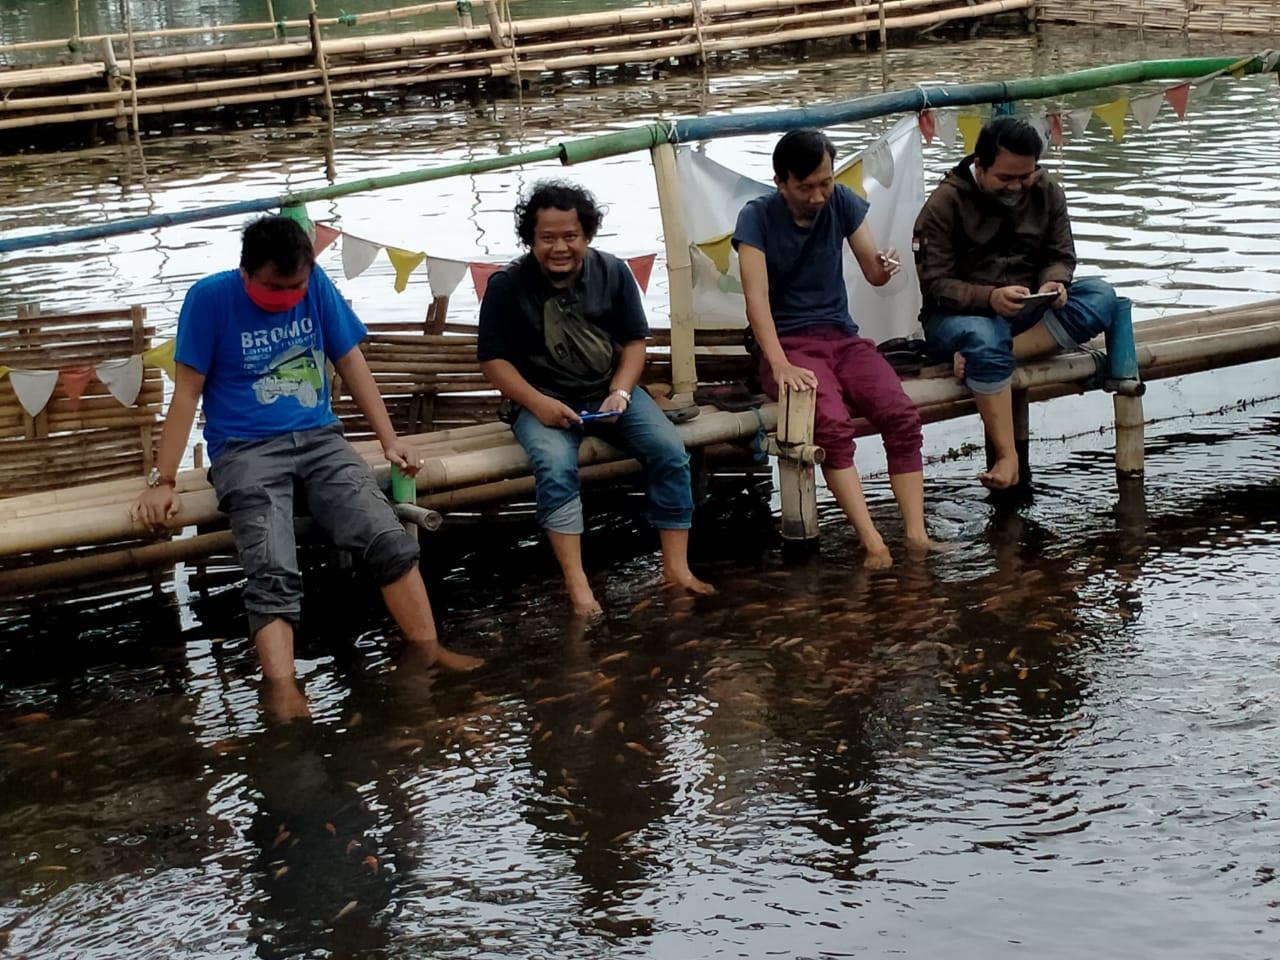 Perawatan kaki dapat dilakukan di Sumber Sentong, Kecamatan Jrebeng Wetan, Kabupaten Kedopok, Kota Probolinggo.  (Foto: Ikhsan Mahmudi / Ngopibareng.id)